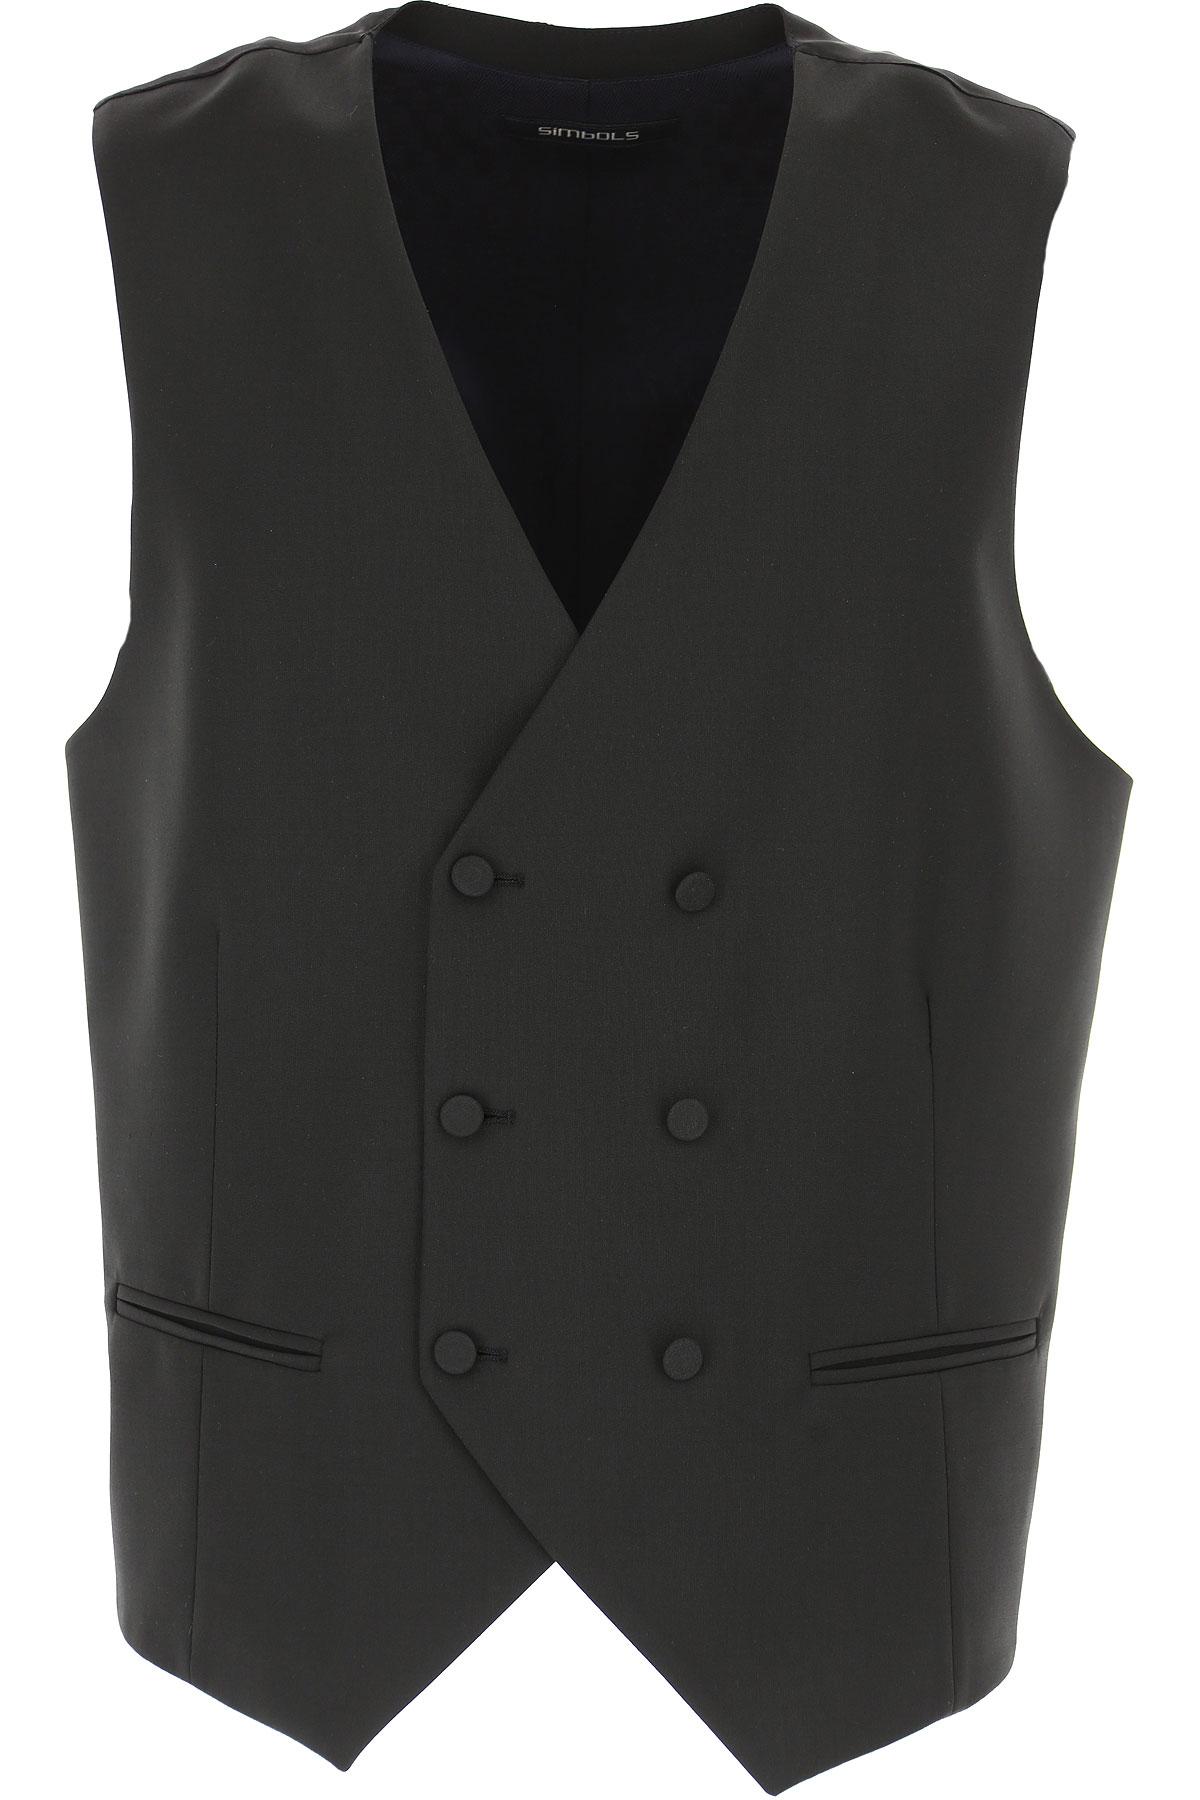 Simbols Mens Clothing, Black, polyester, 2019, L M S XL